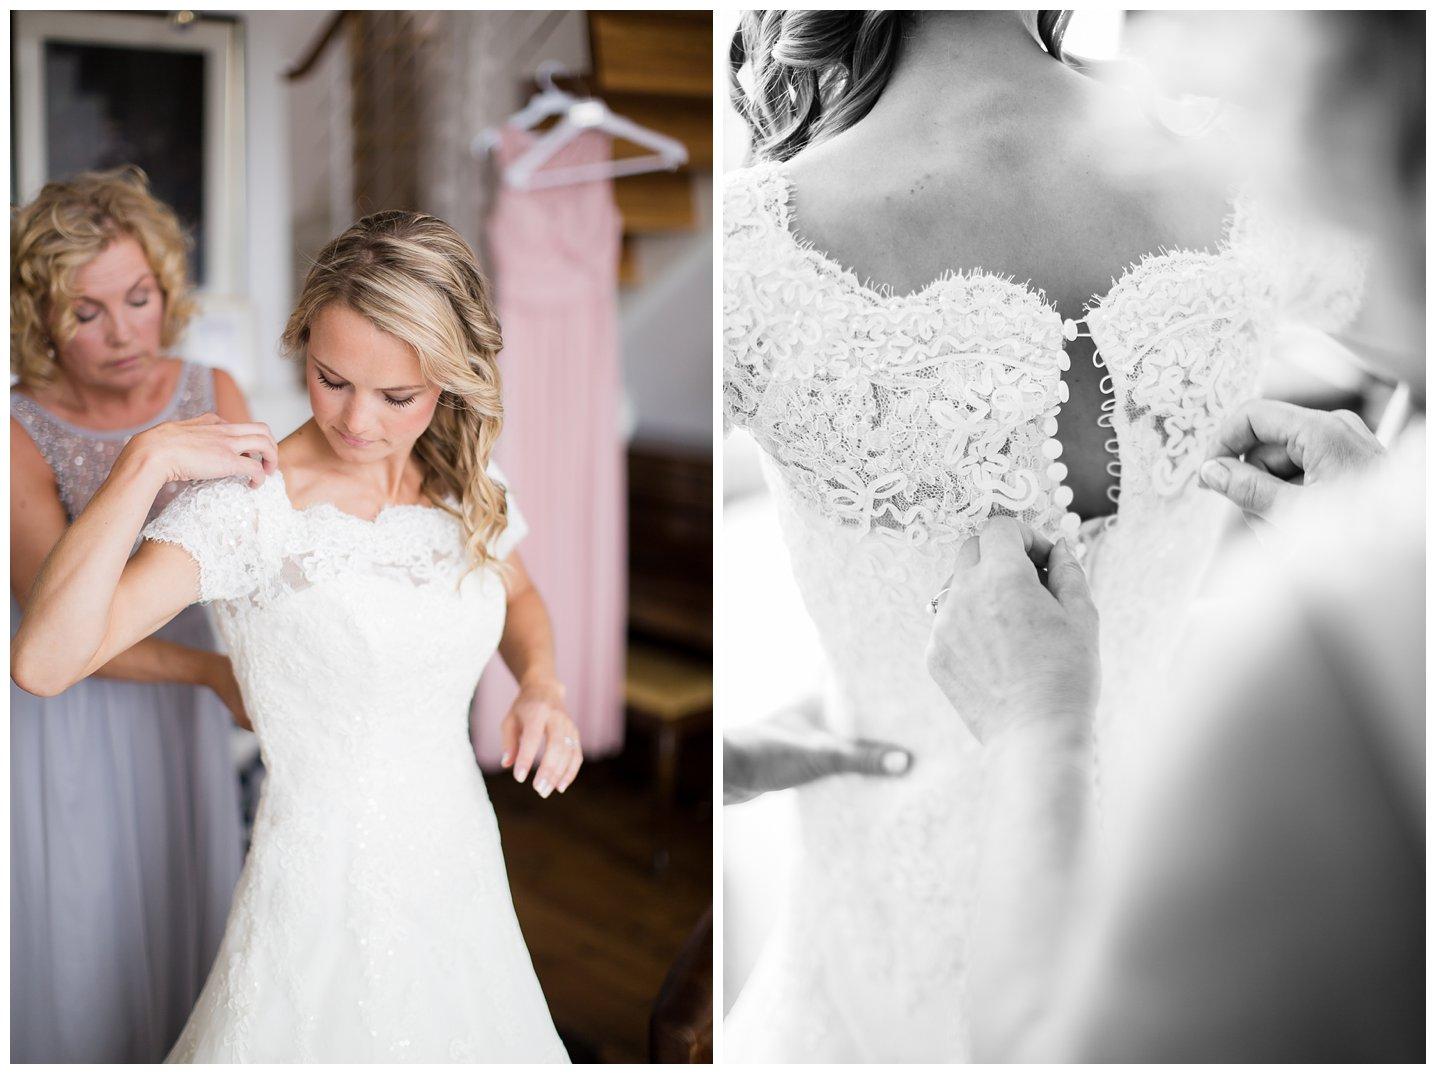 Fotograf-Eline-Jacobine-Bryllup-Villa-Malla-Camilla-og-Alexander_0028